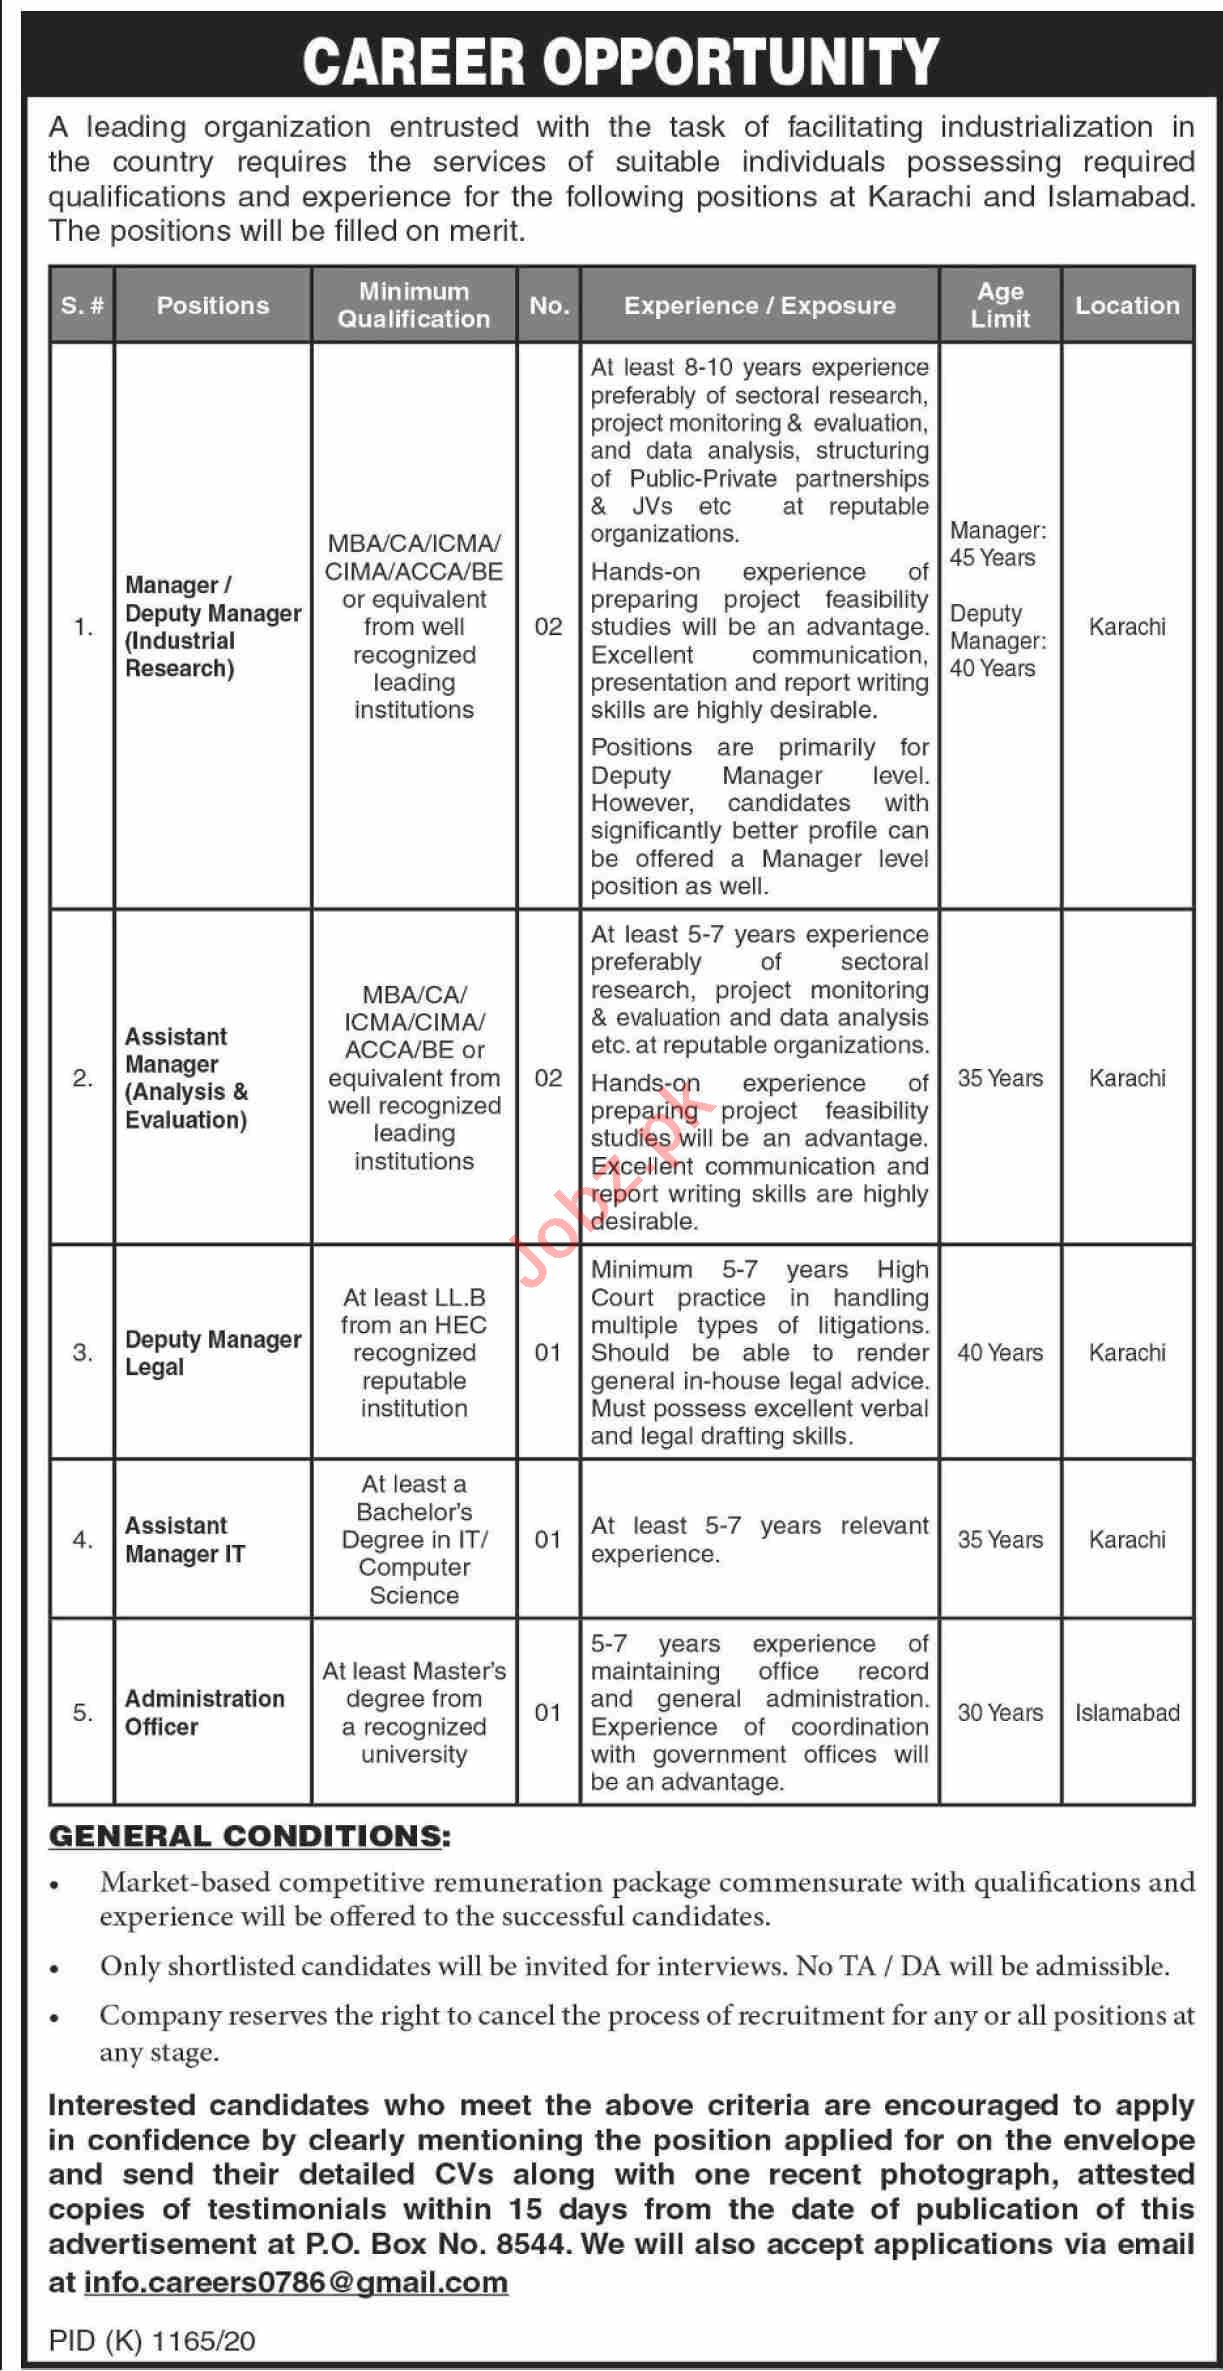 P O Box No 8544 Karachi Public Sector Organization Jobs 2020